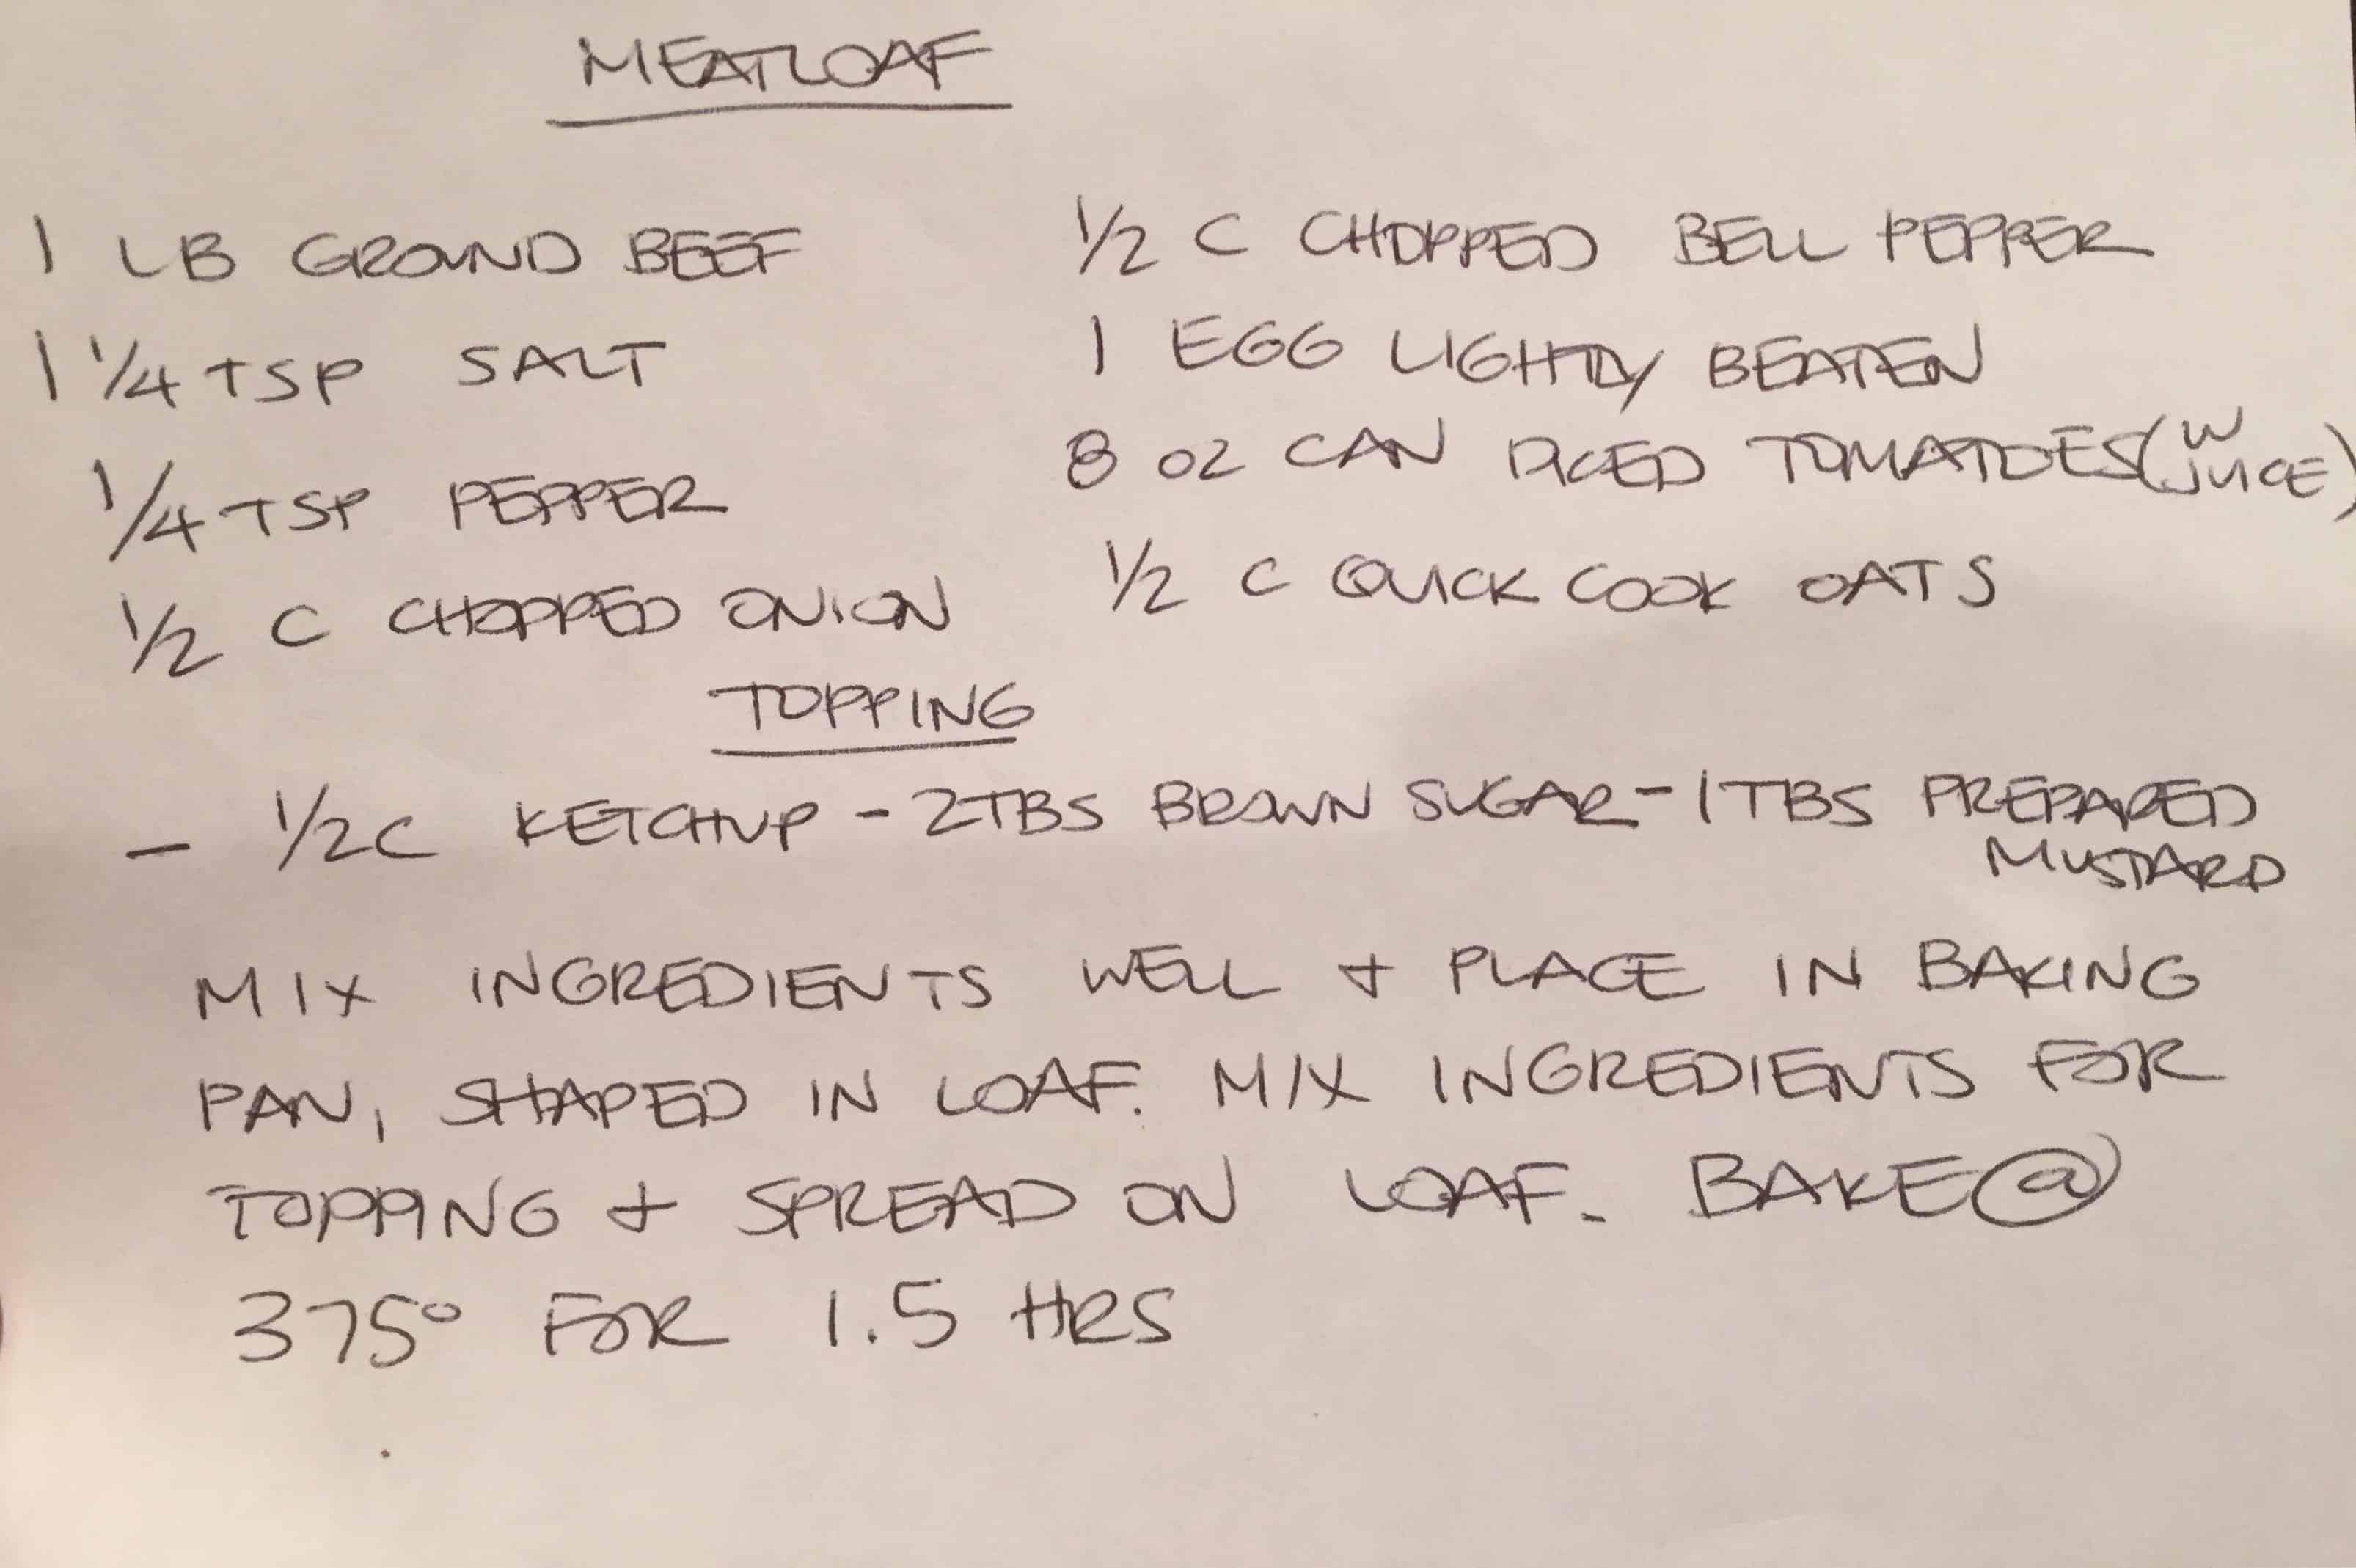 Making a Meal Plan